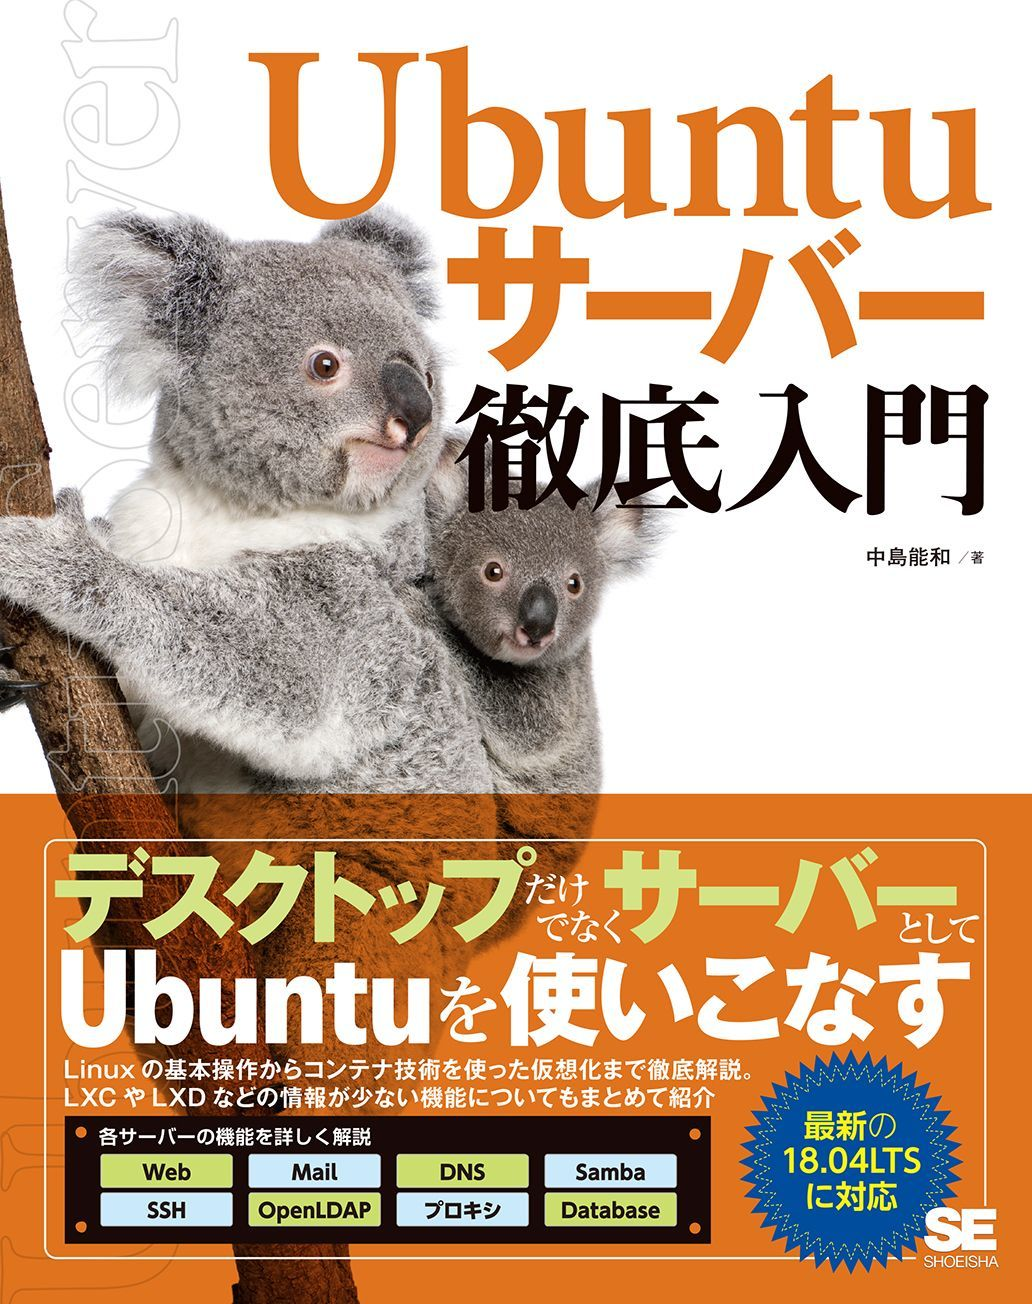 Ubuntuサーバー徹底入門(翔泳社)